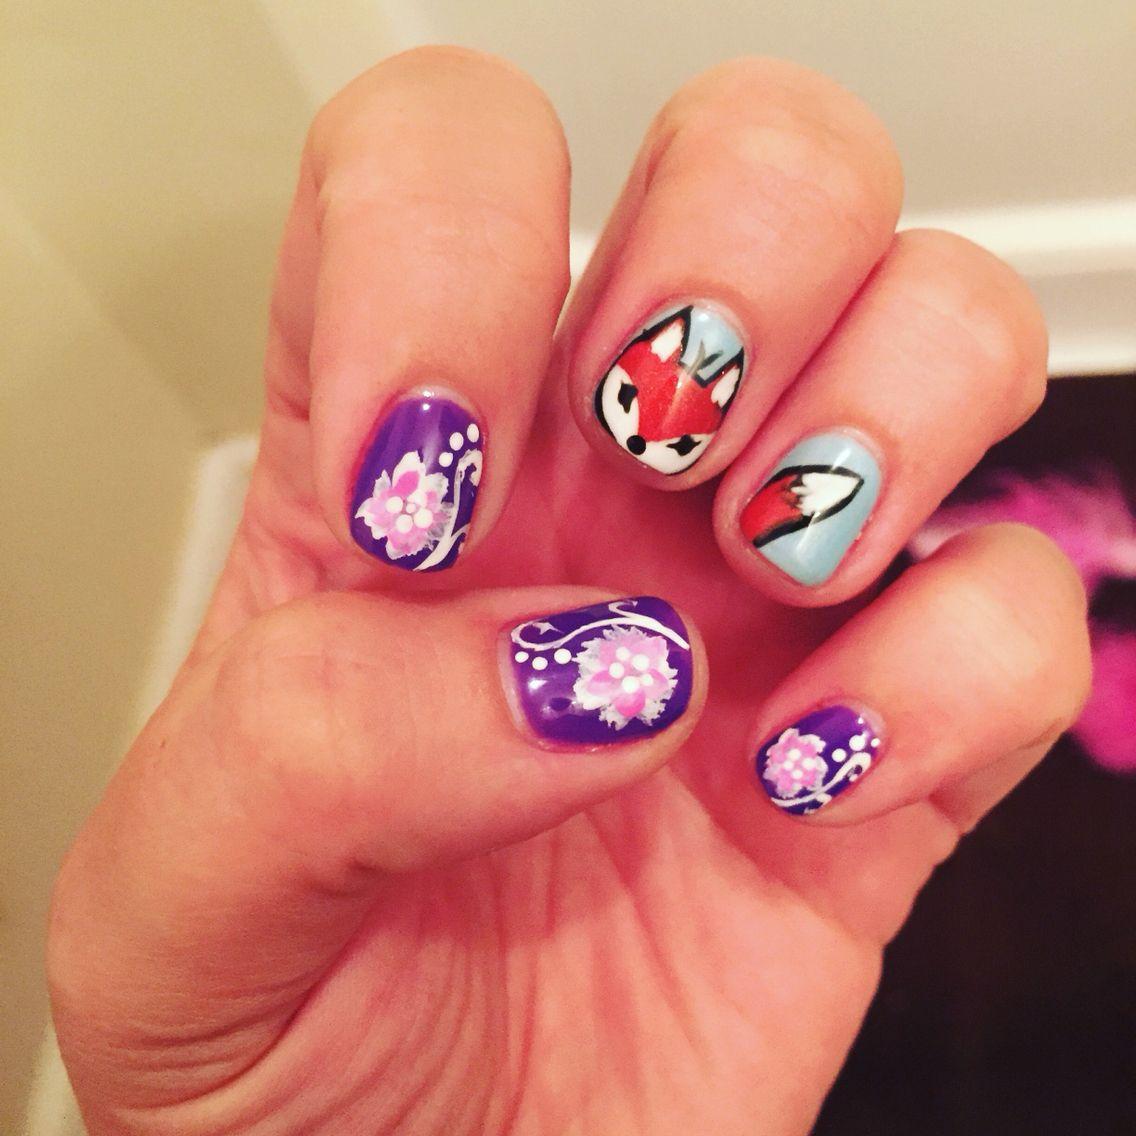 Fox nails, purple nail designs | Nail Art | Pinterest | Fox nails ...